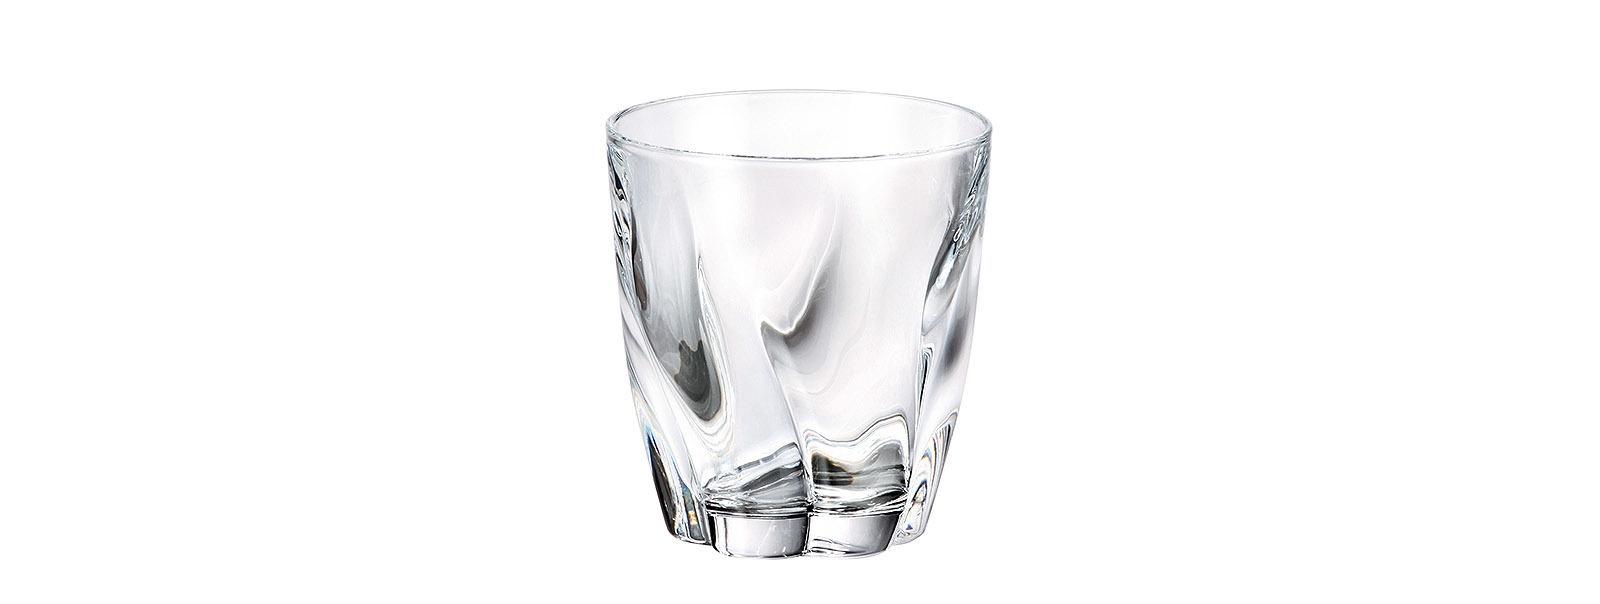 Набор стаканов 320 мл BARLEY TWIST